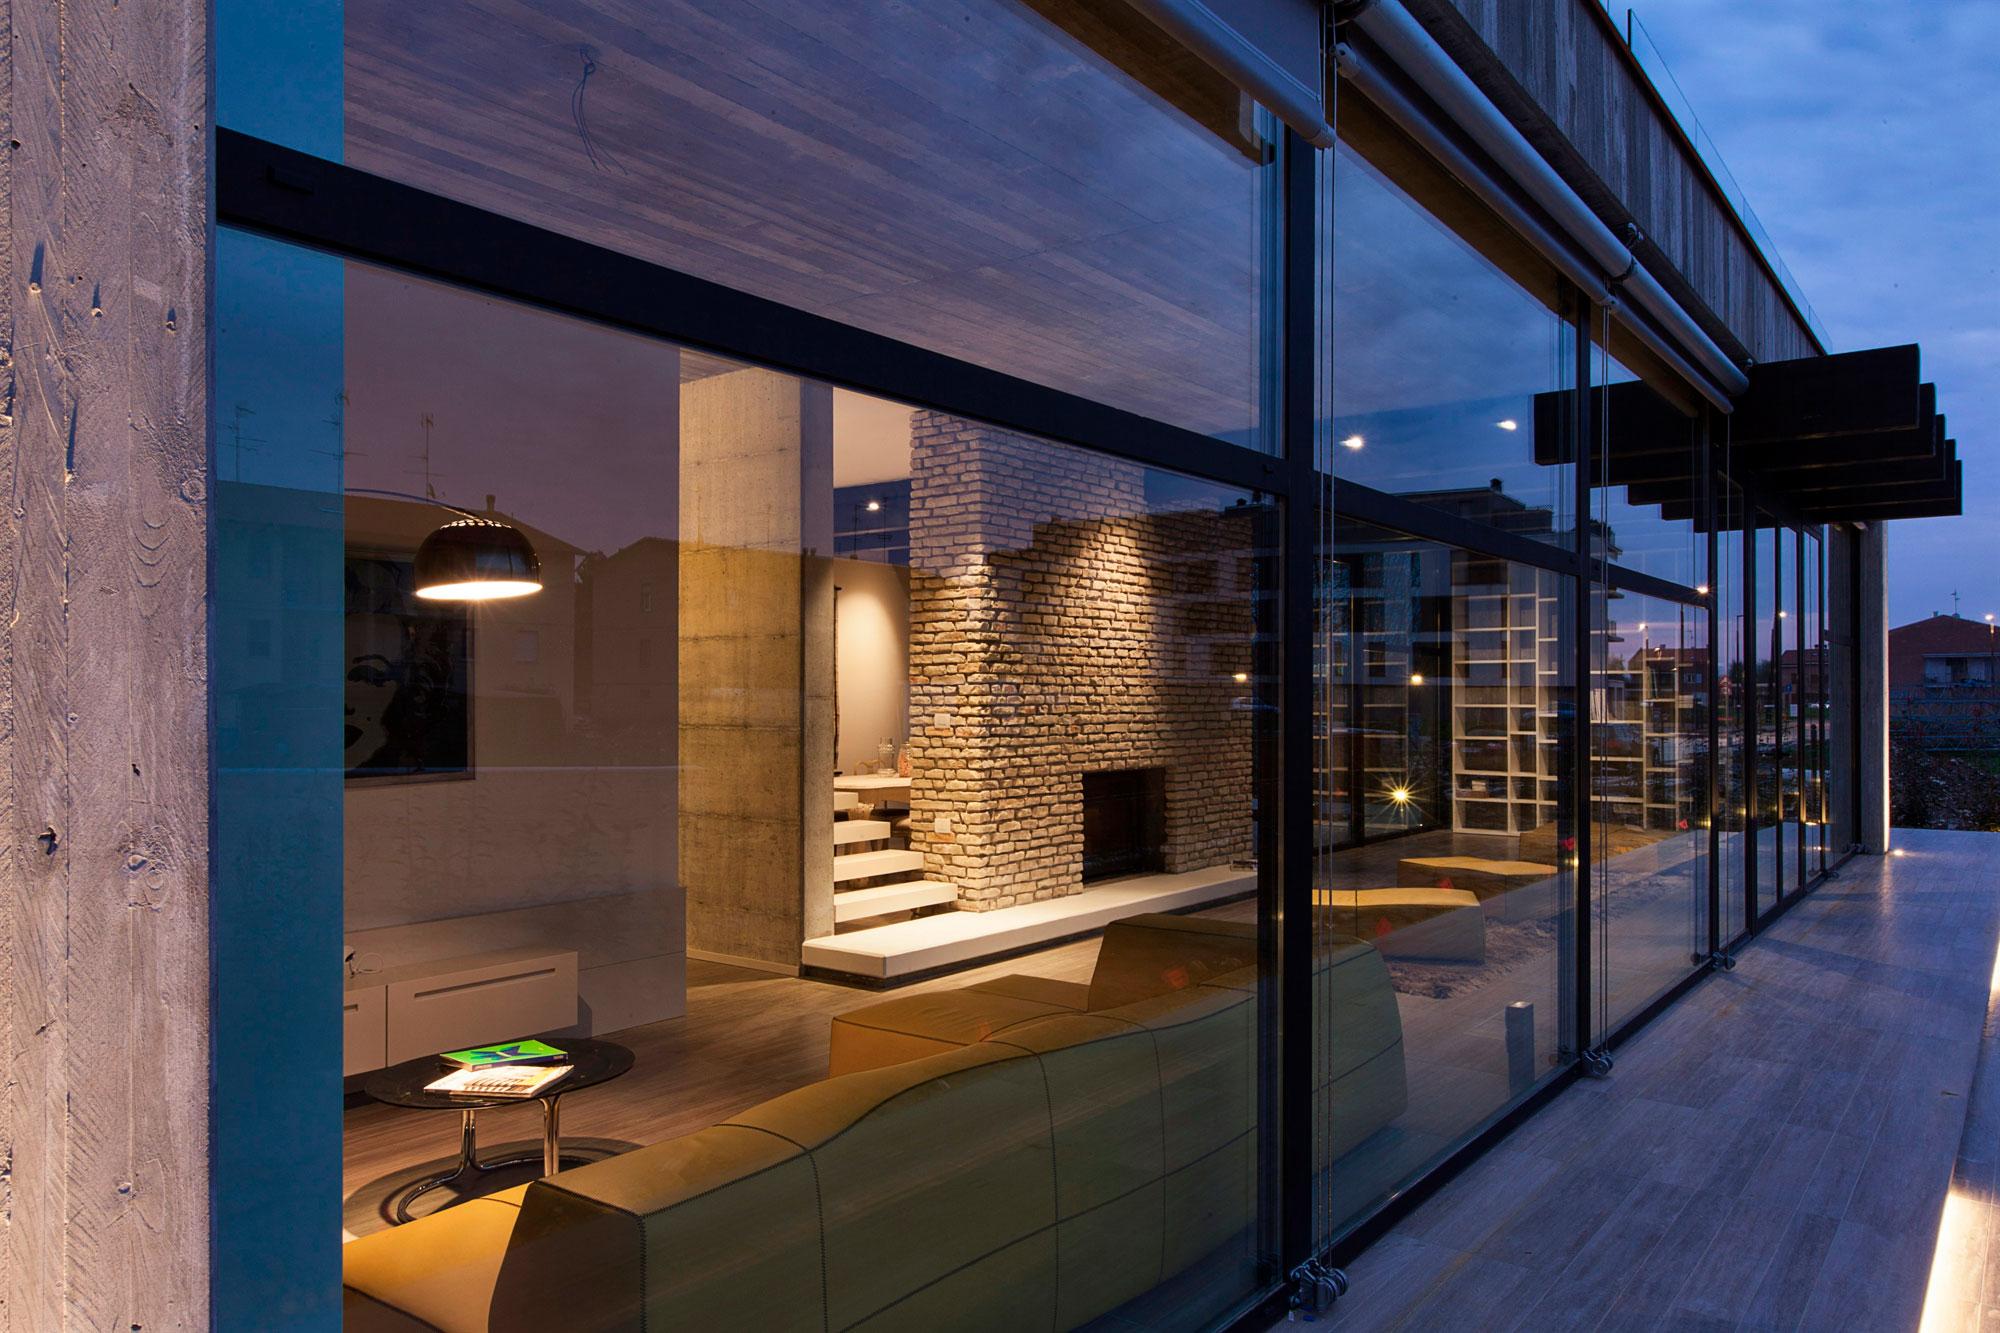 D'Autore Residence near Bologna by Giraldi Associati Architetti-45